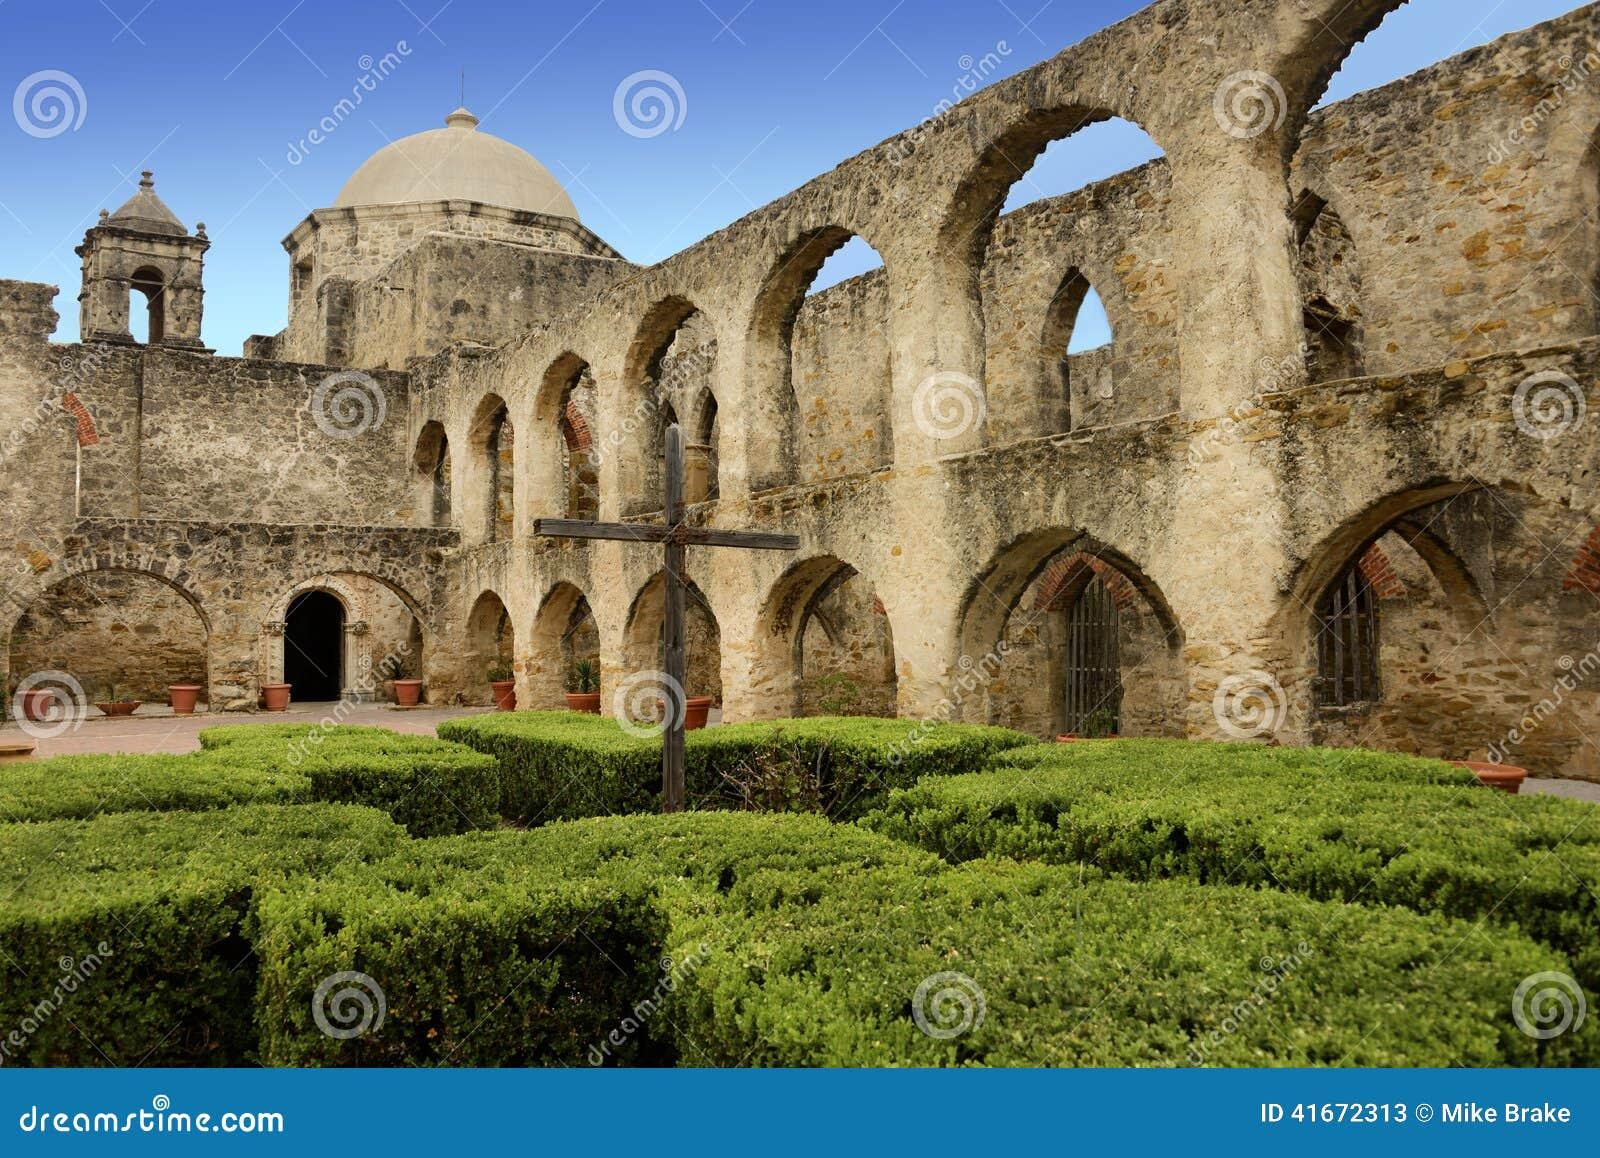 Mission San Jose San Antonio Texas Stock Image Image Of